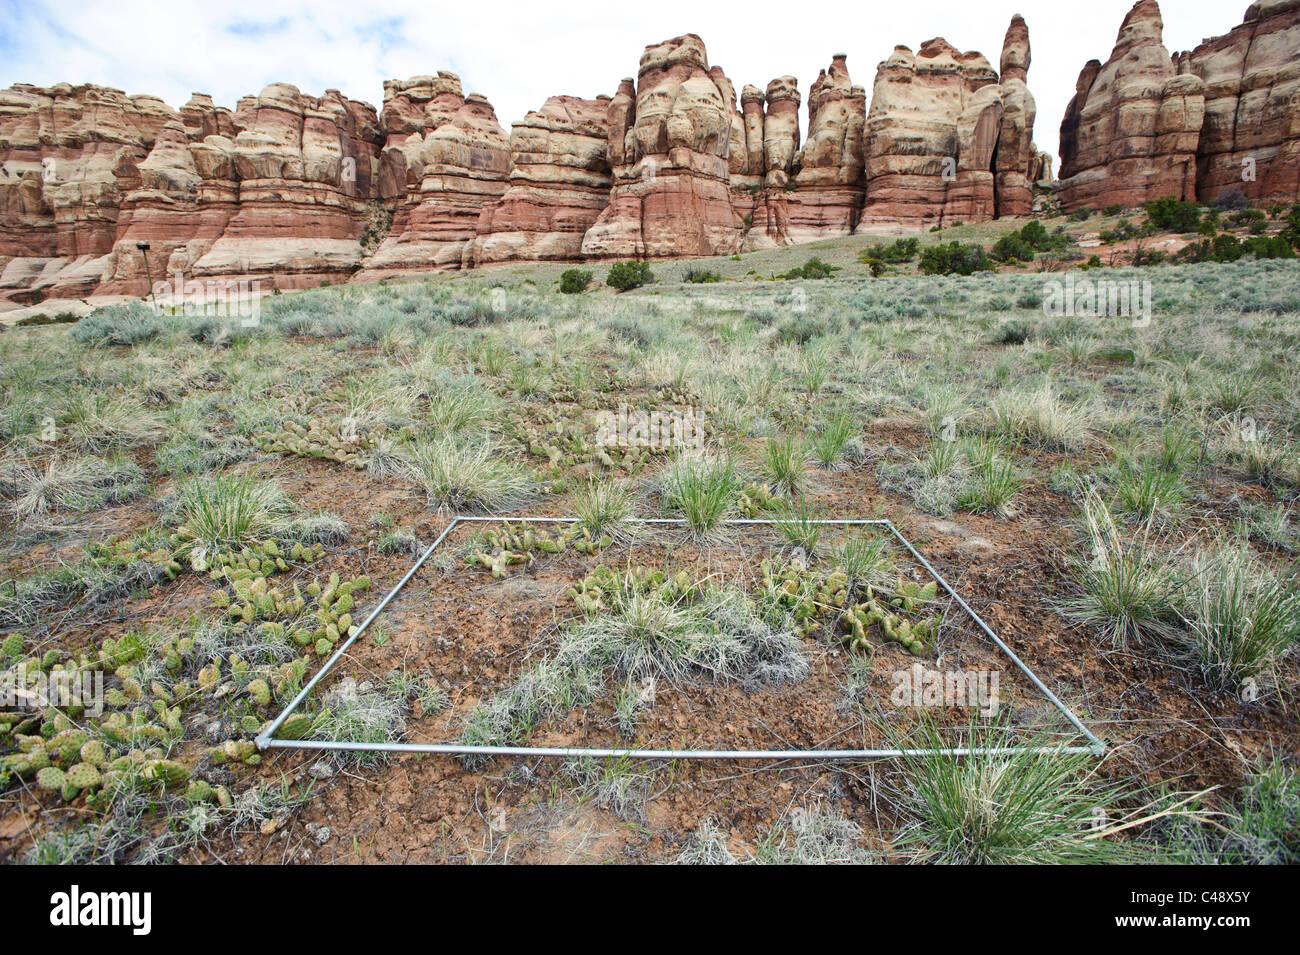 Researcher sets ups rain-out study plot, Needles District, Canyonlands NP, UT - Stock Image